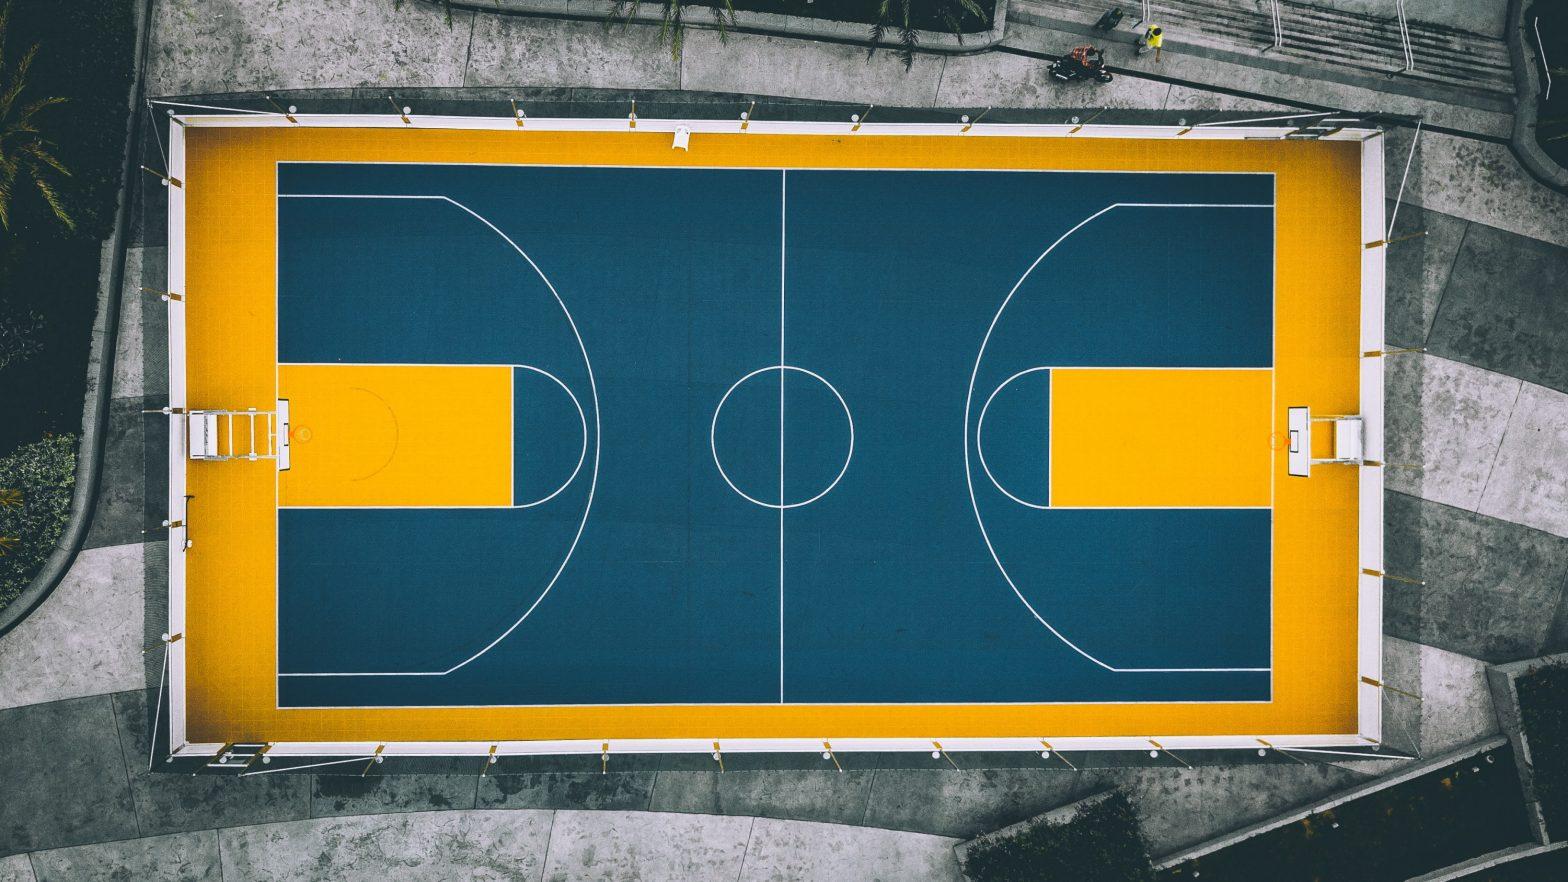 ABNK - Fantasy Sport business